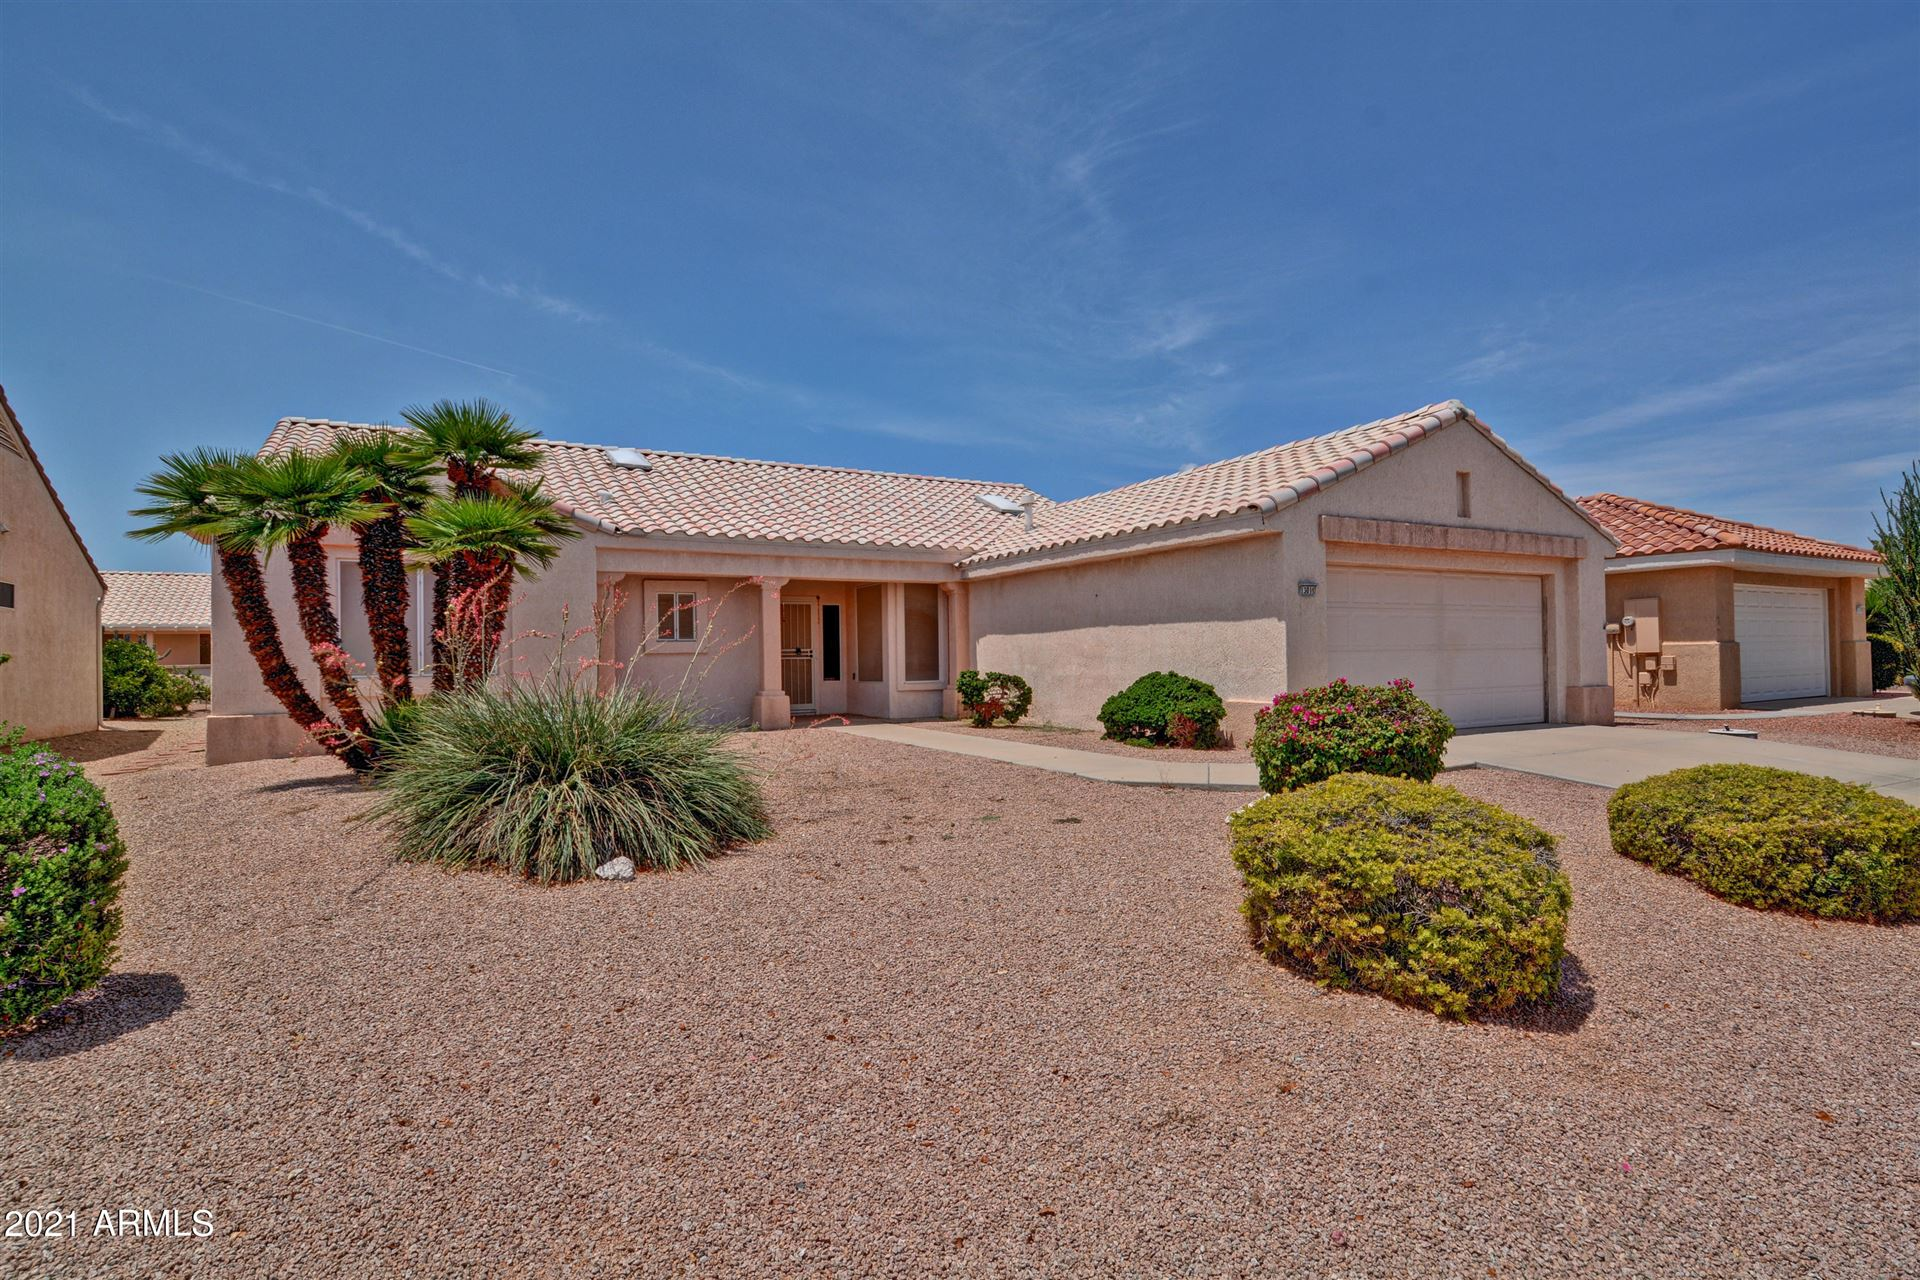 Photo of 13011 W CARAWAY Drive, Sun City West, AZ 85375 (MLS # 6270425)